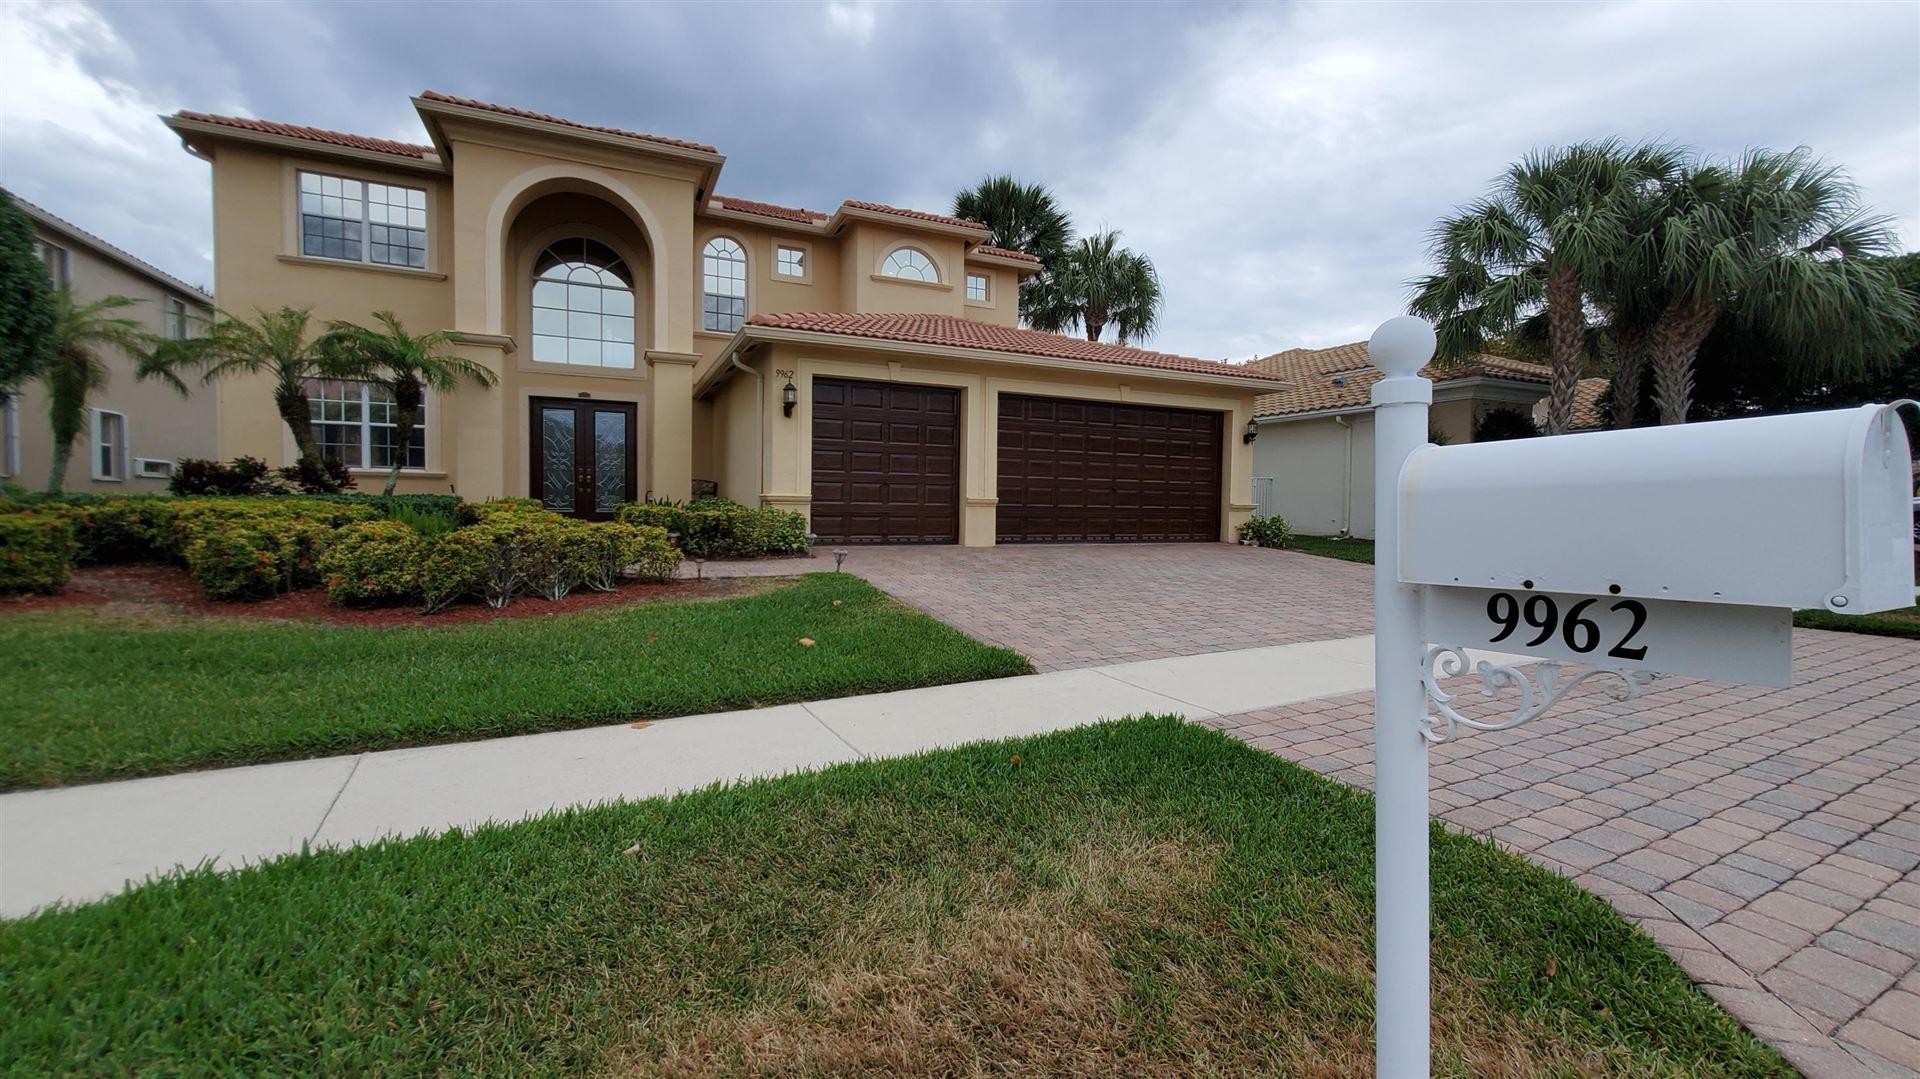 9962 Via Amati, Lake Worth, FL 33467 - #: RX-10615111